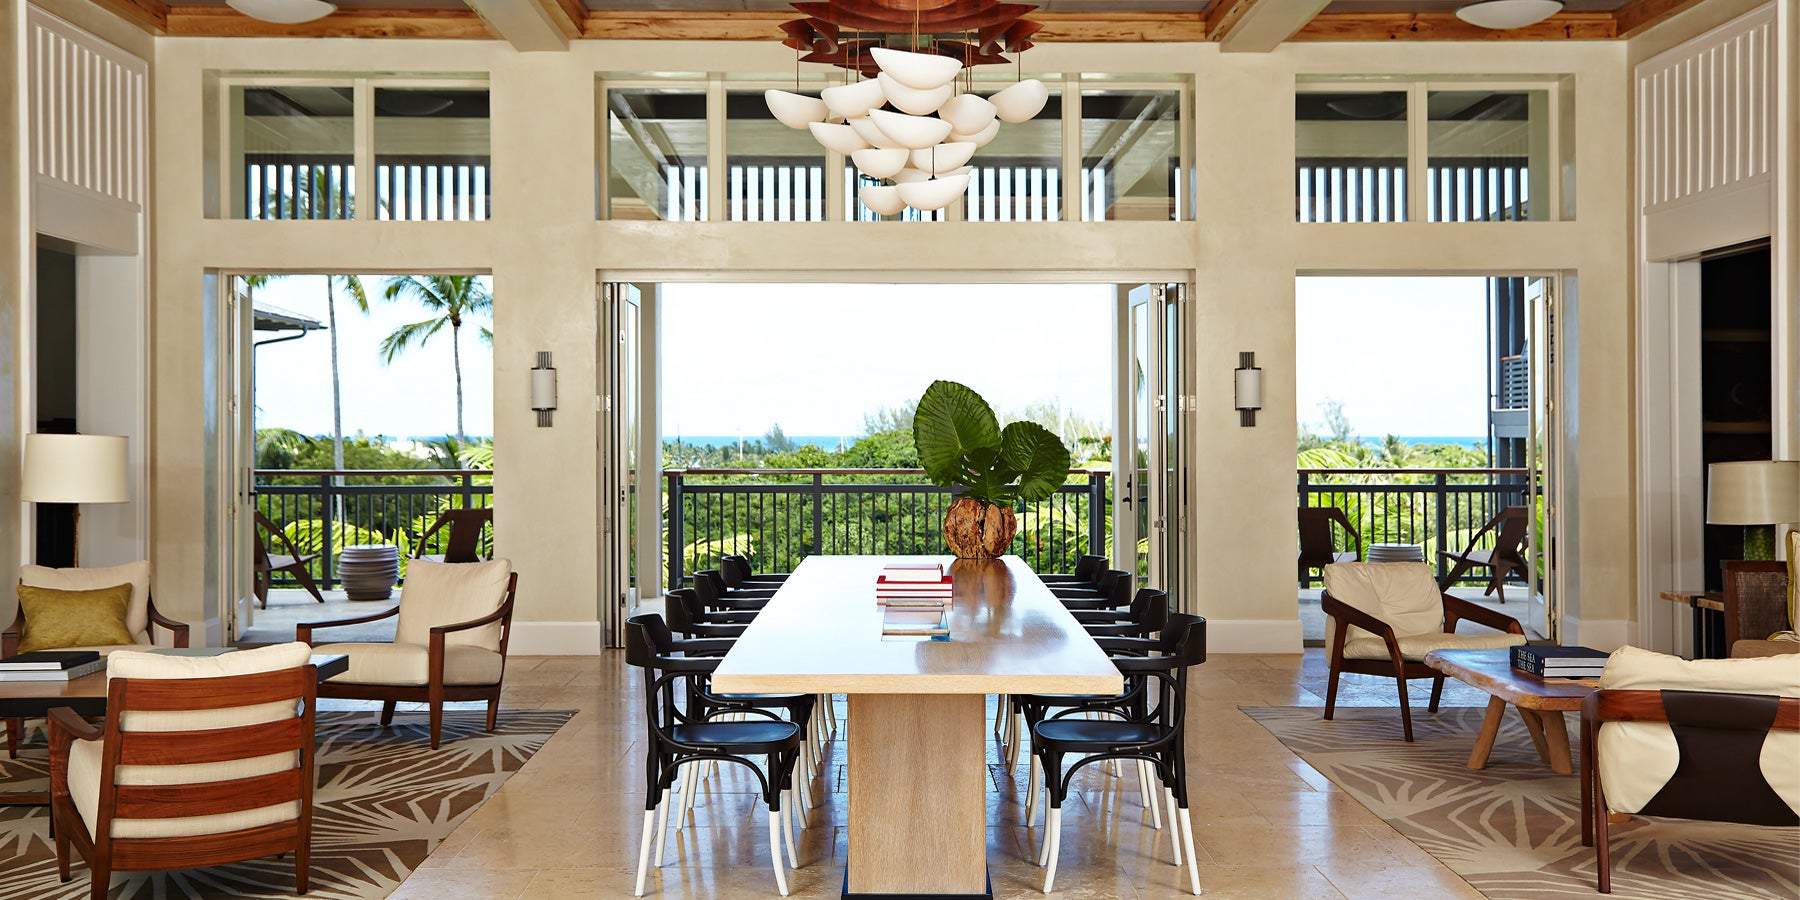 Alexandra Champalimaud Trailblazed Welcoming Design 1stdibs